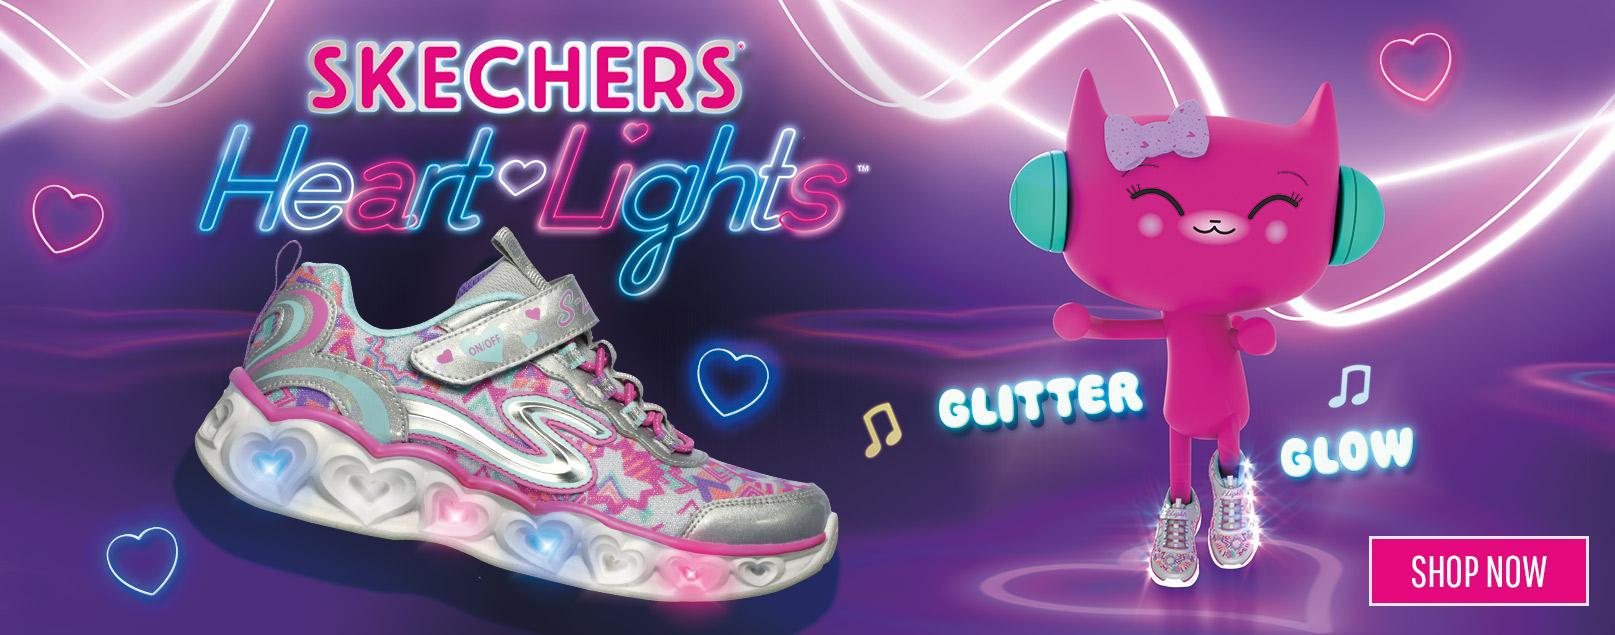 f7f3023d232f55 skechers heart lights